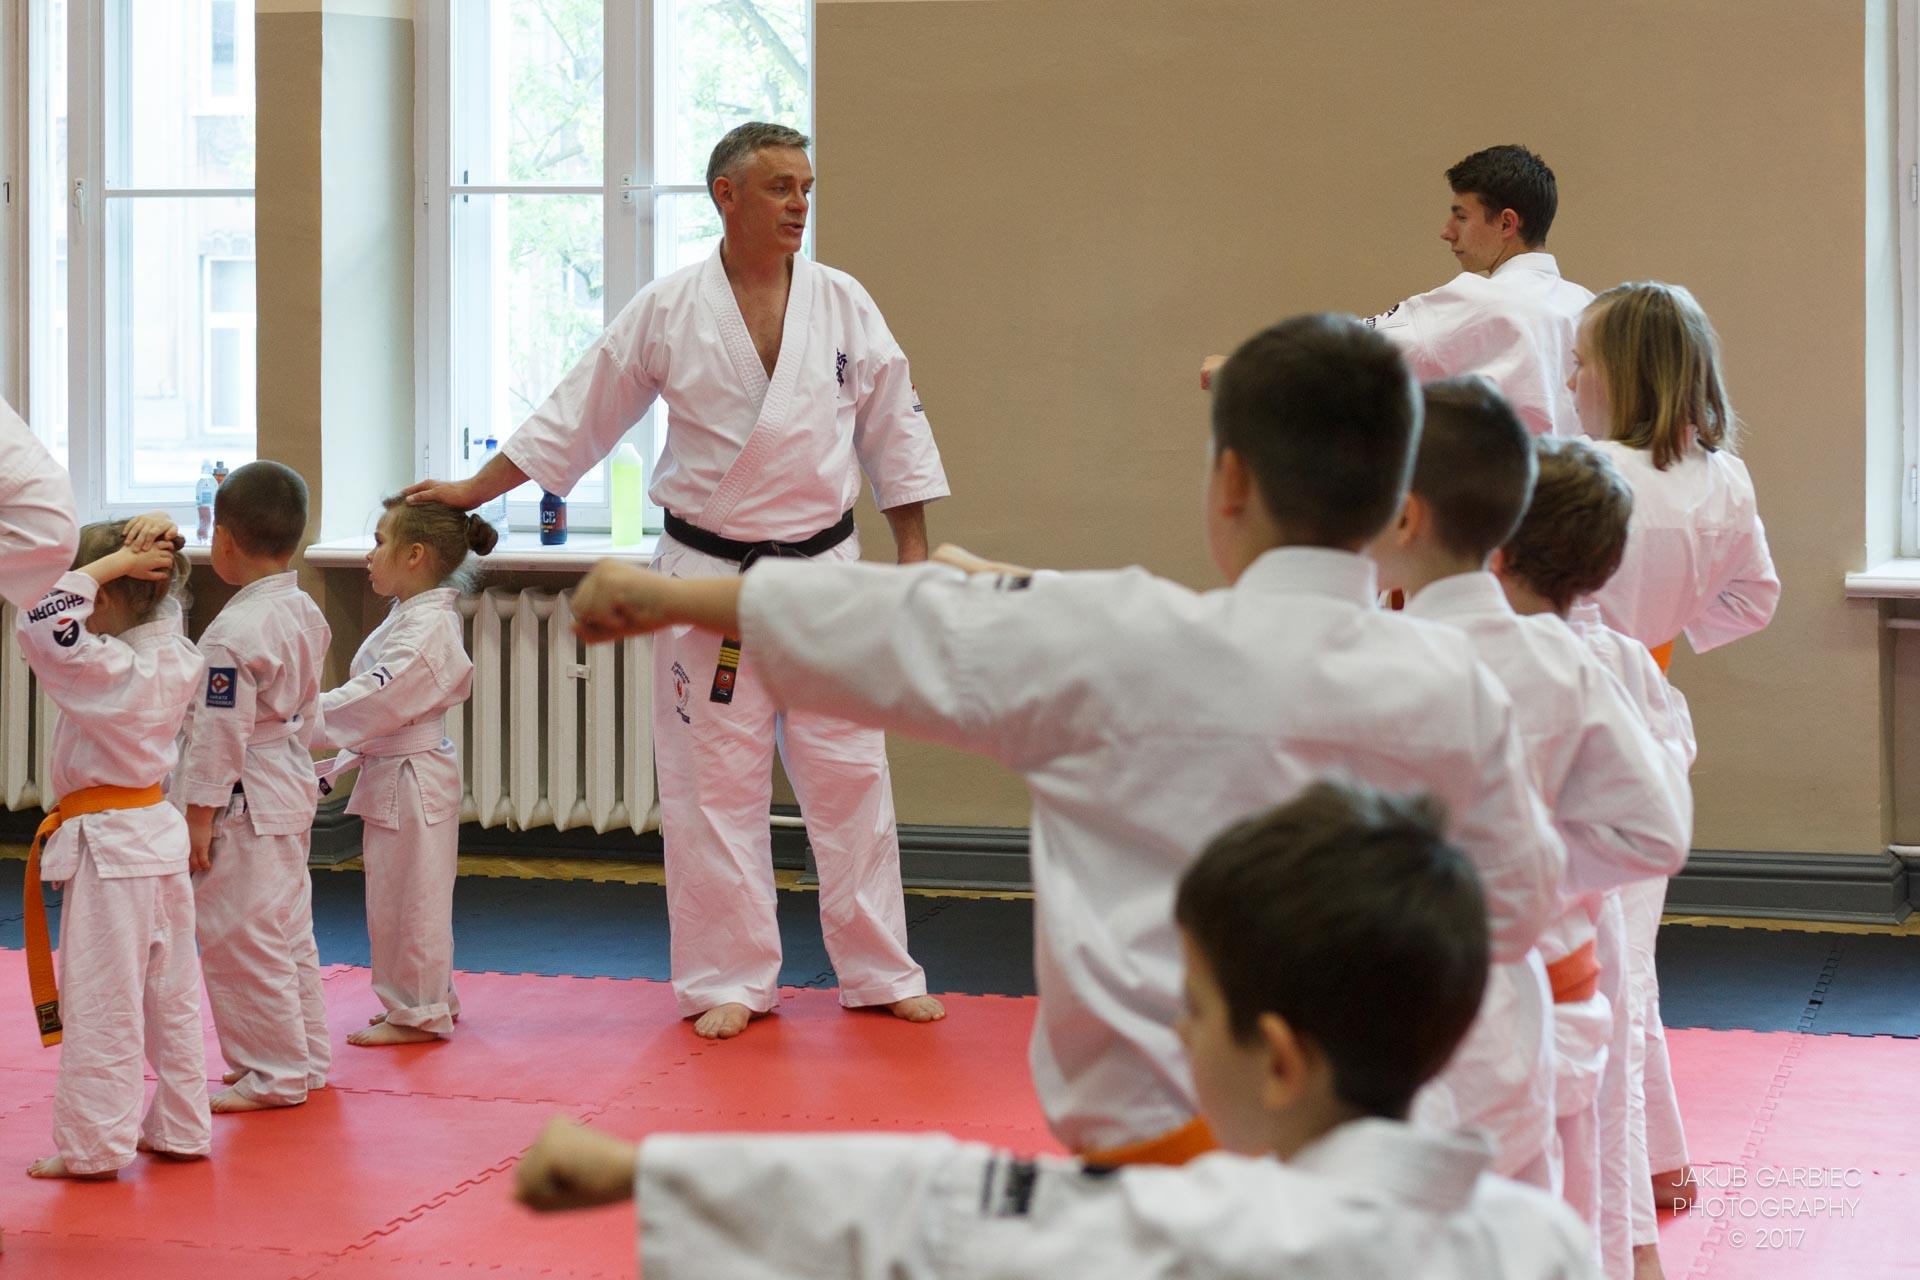 egzamin-karate-mistrz-mariusz-mazur-klub-karate-shodan-2017-06-02-15